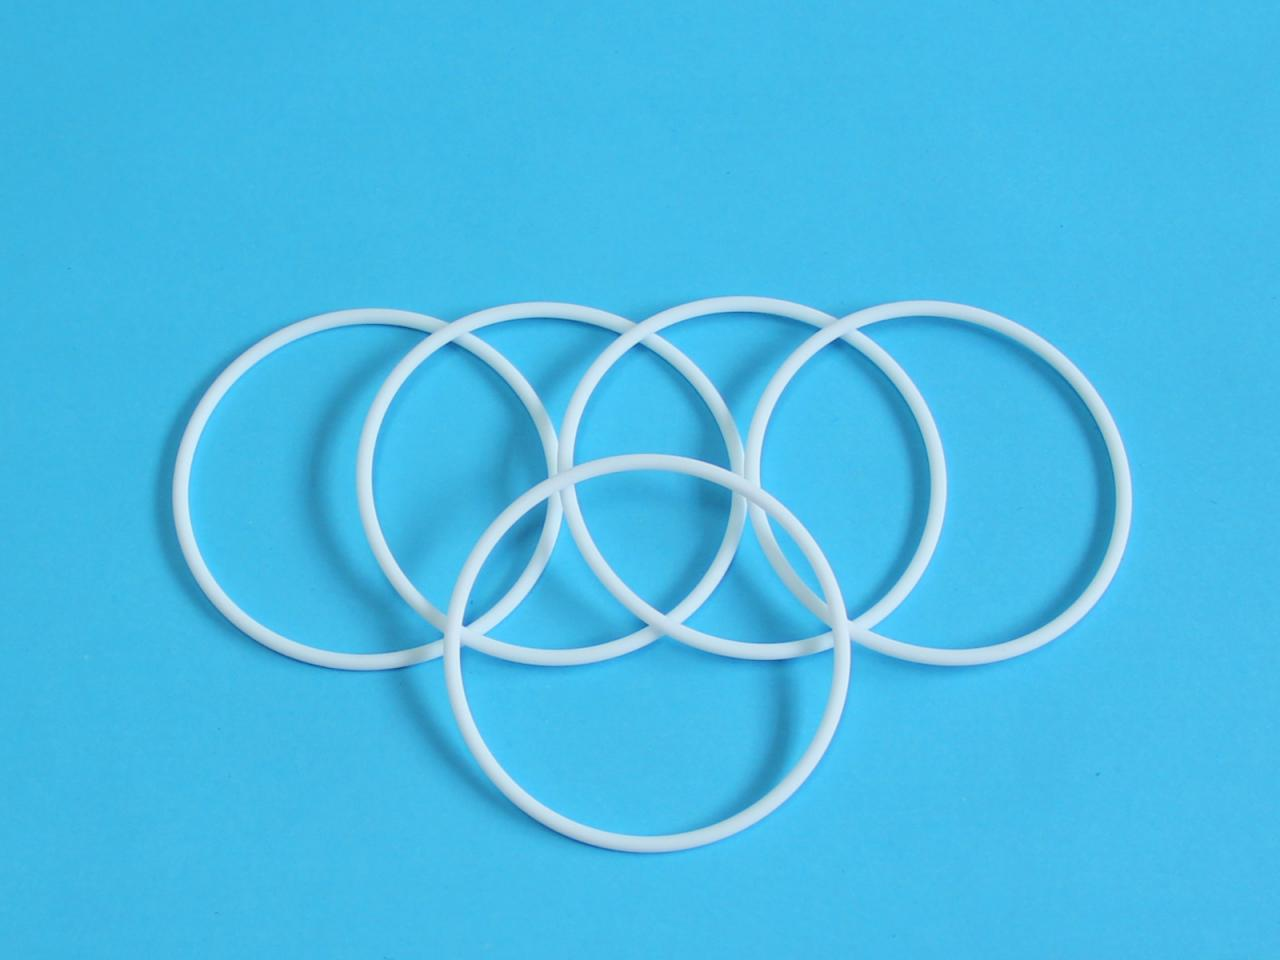 DSH-Piston Seal Catalogue | O Ring Nbr Fkm Silicone Rubber Ptfe-2